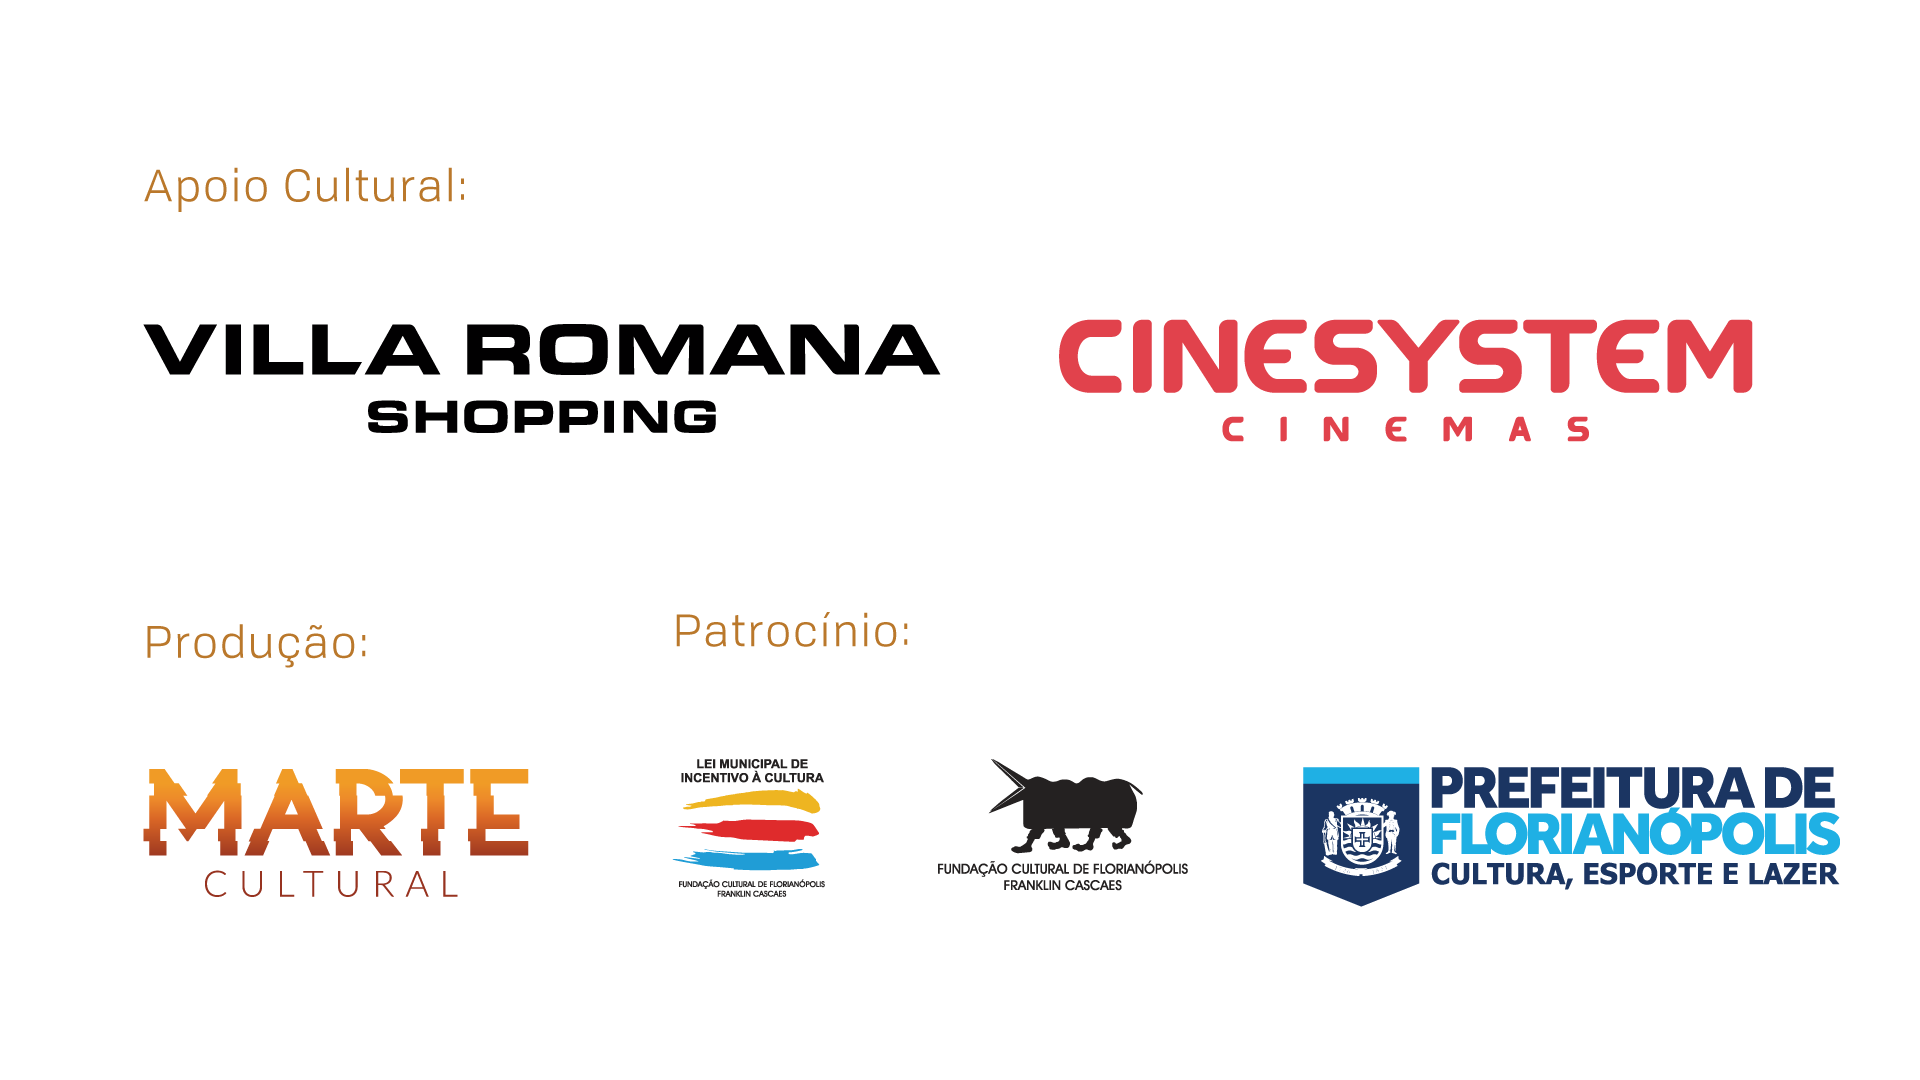 https://marte.art.br/domingocomteatro/wp-content/uploads/sites/6/2021/08/logos.png